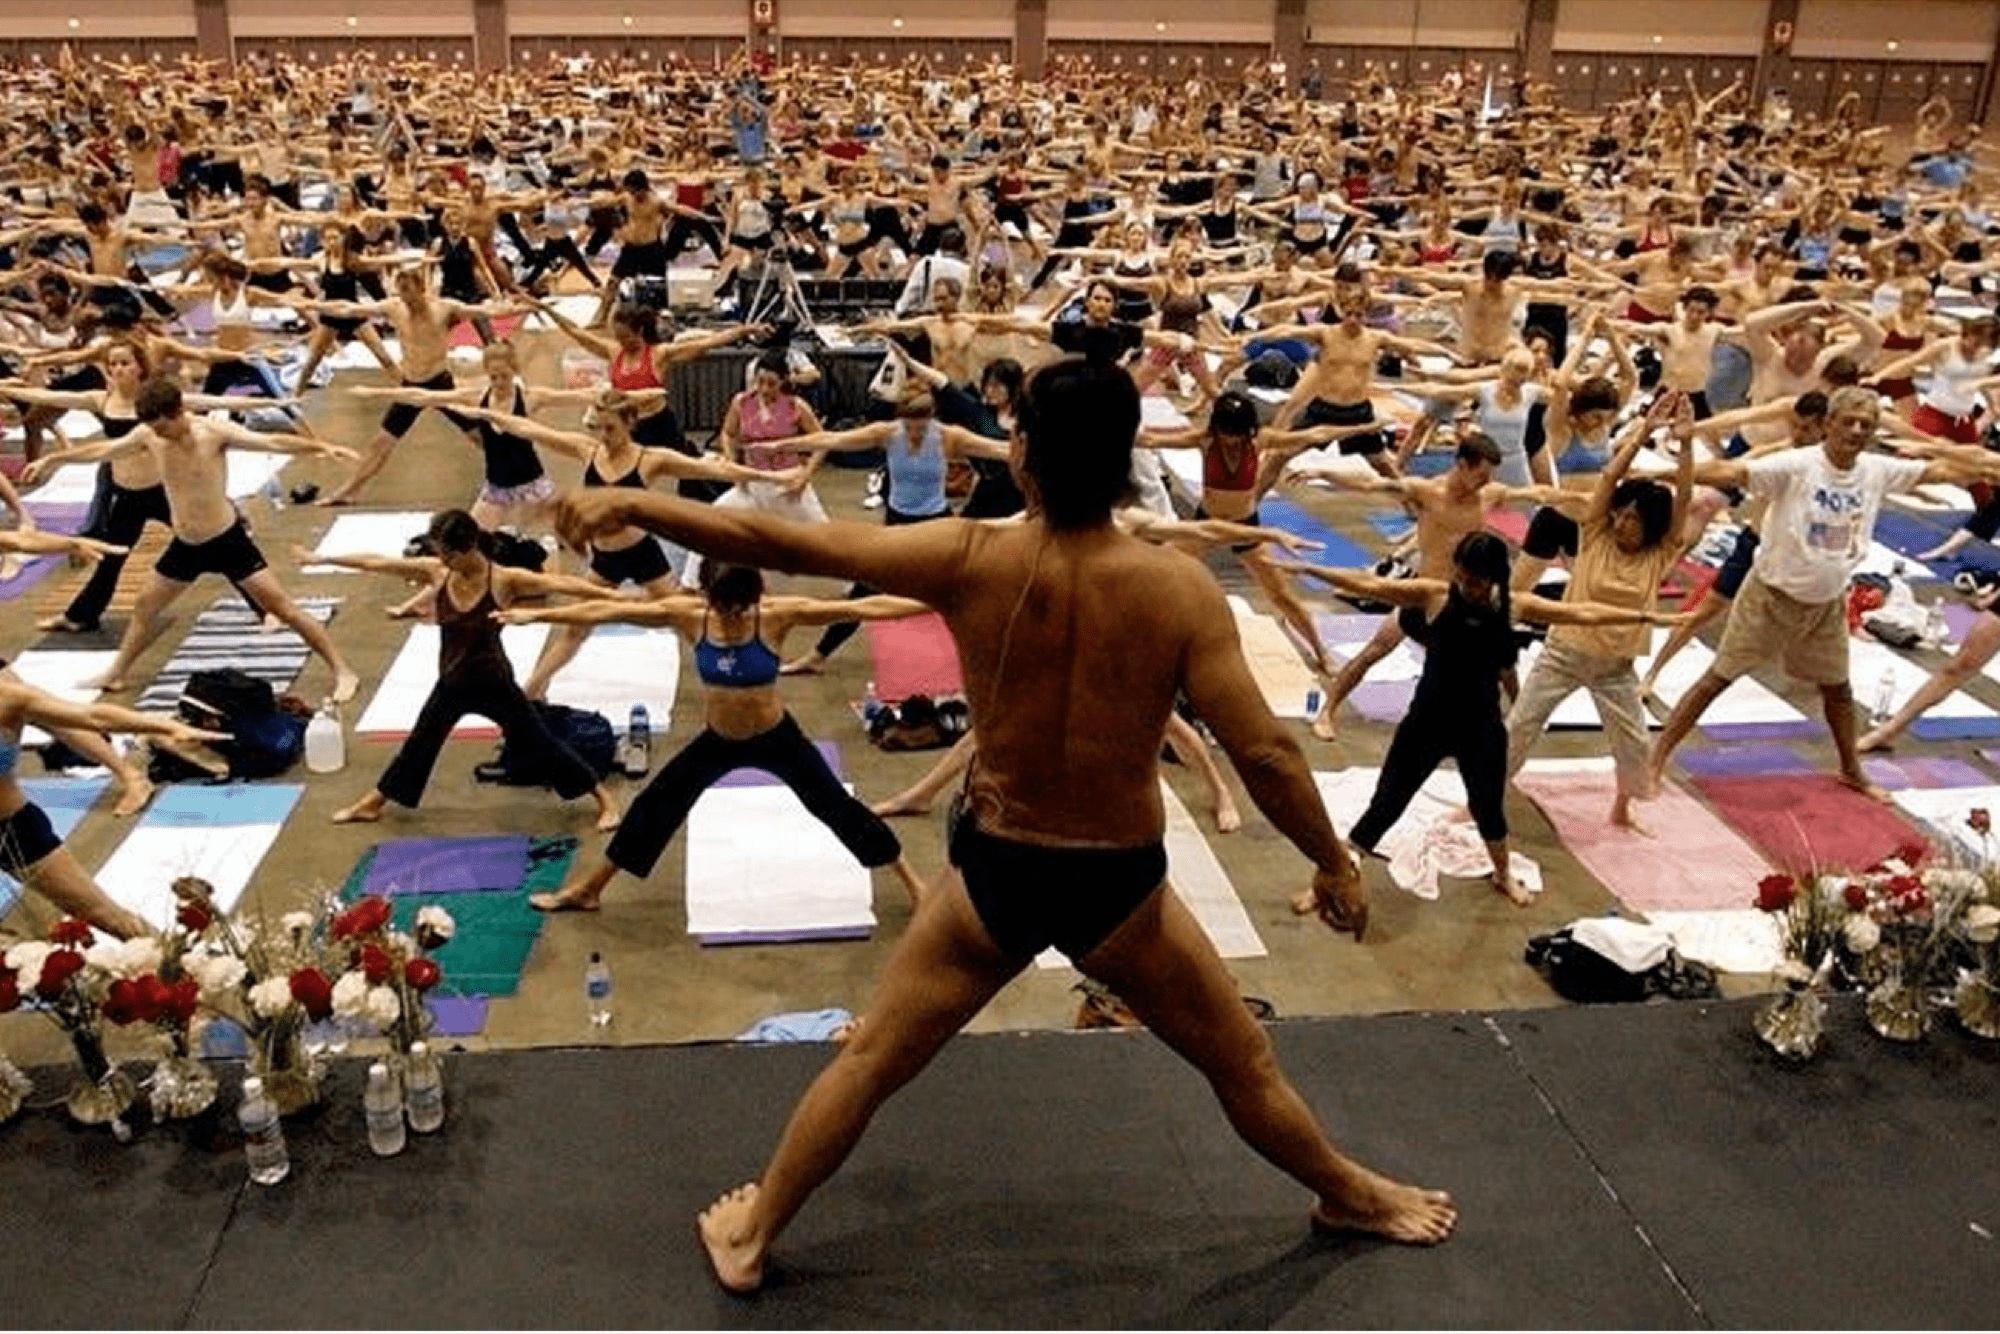 Bikram Yoga or Hot Yoga